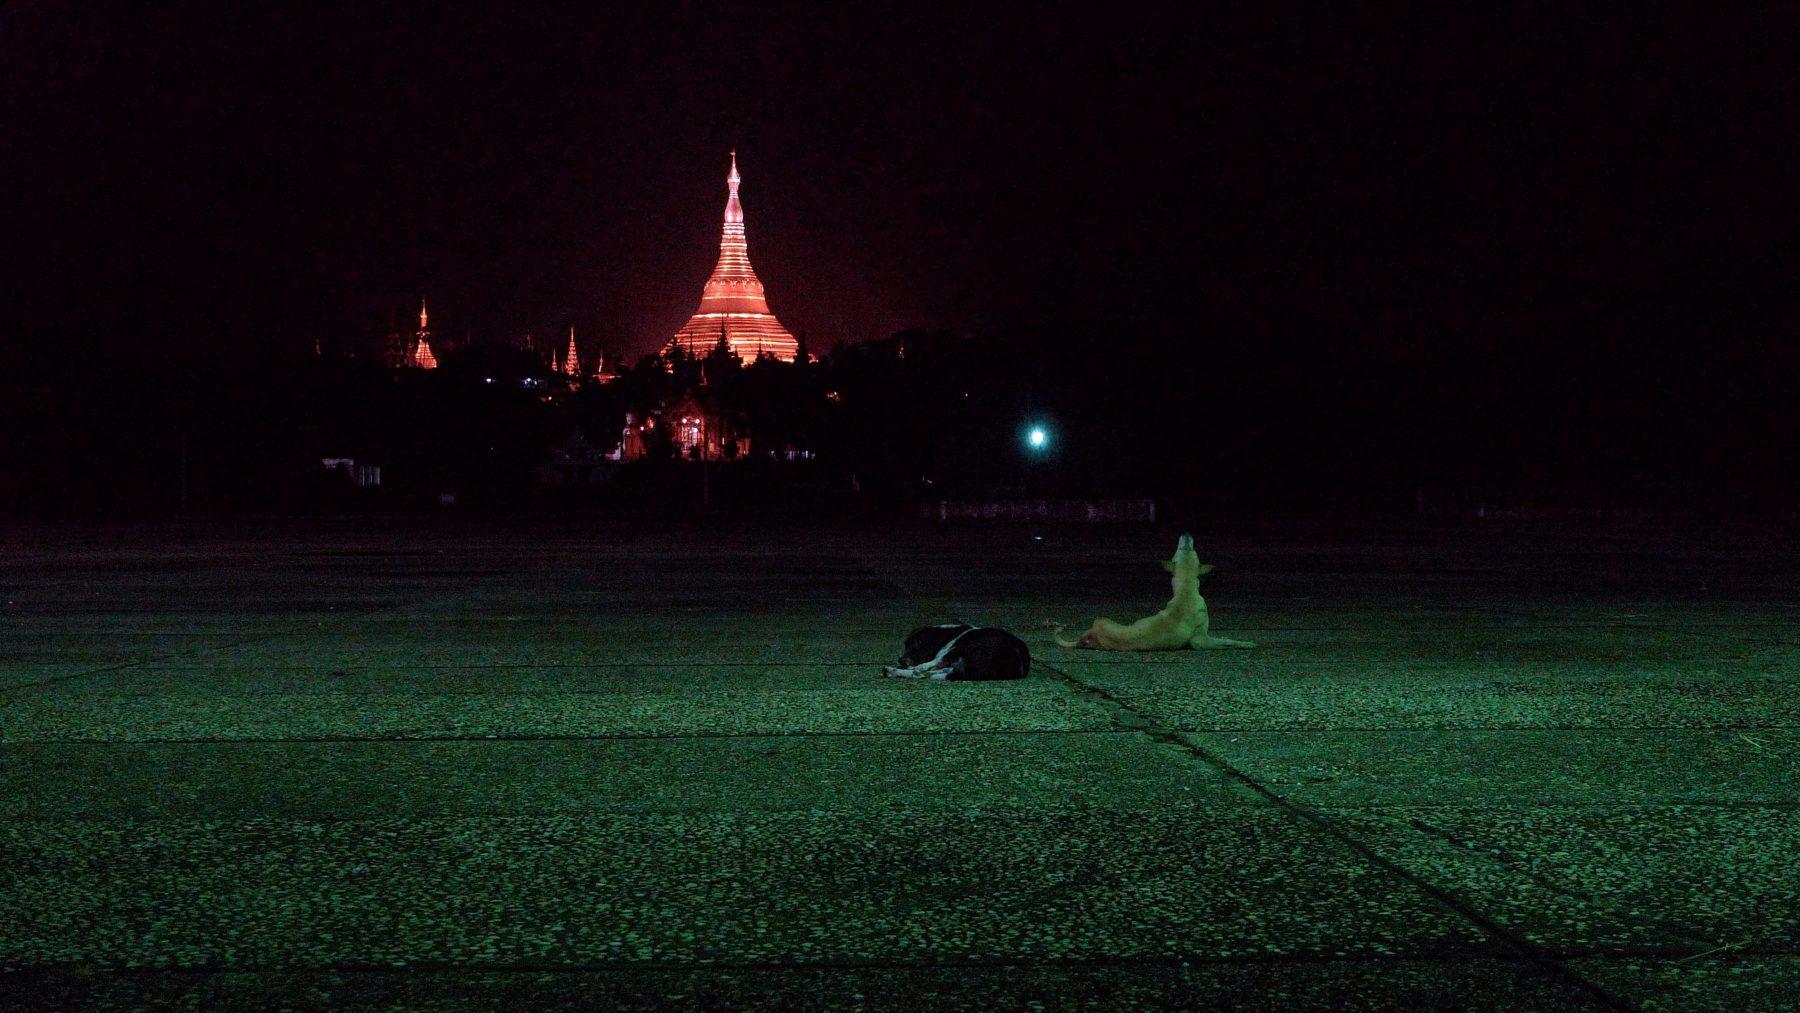 Image: Yangon Midnight